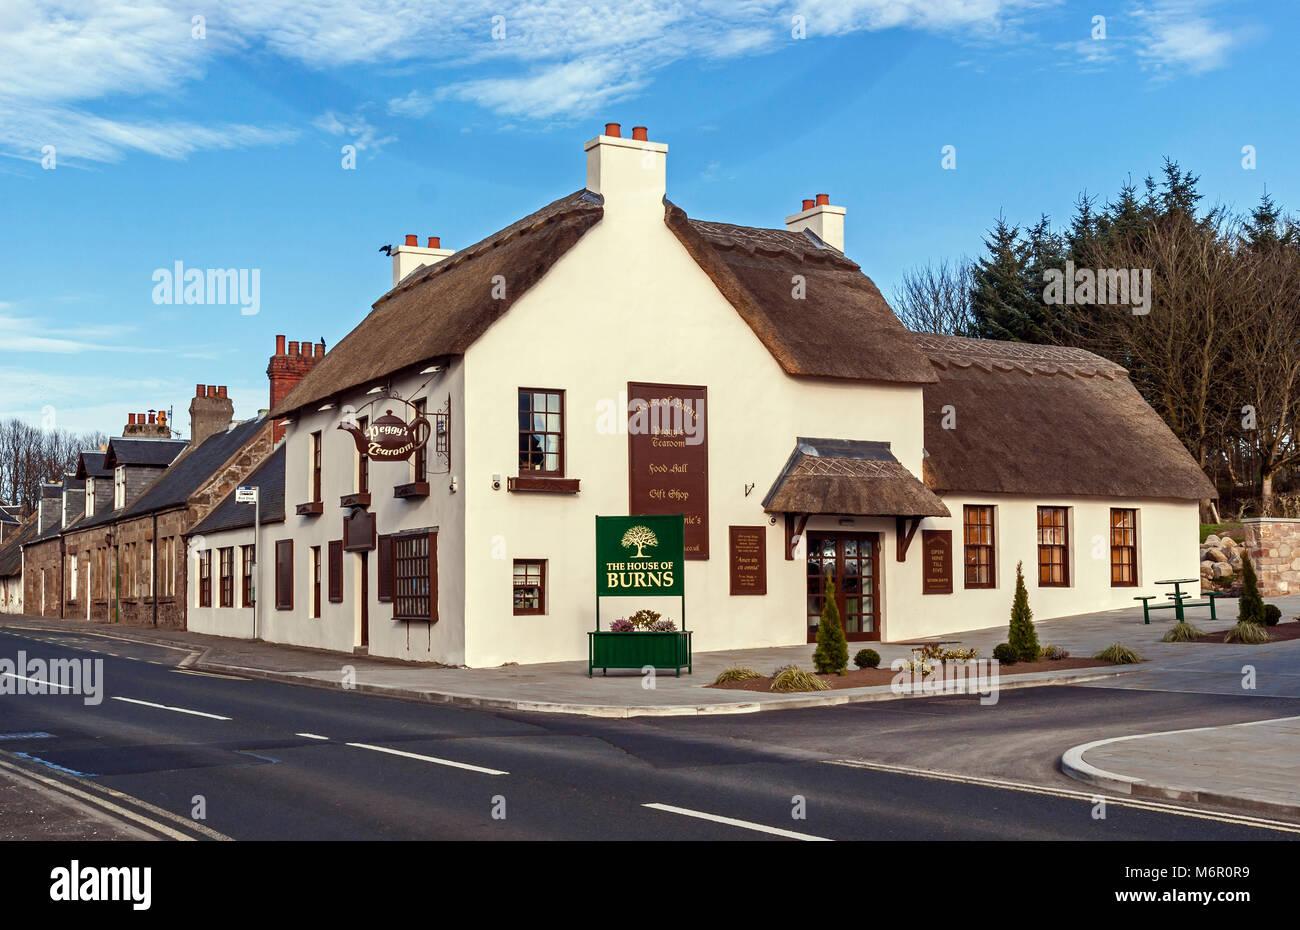 The House of Burns Peggy's tearoom in Kirkoswald Ayrshire Scotland UK - Stock Image